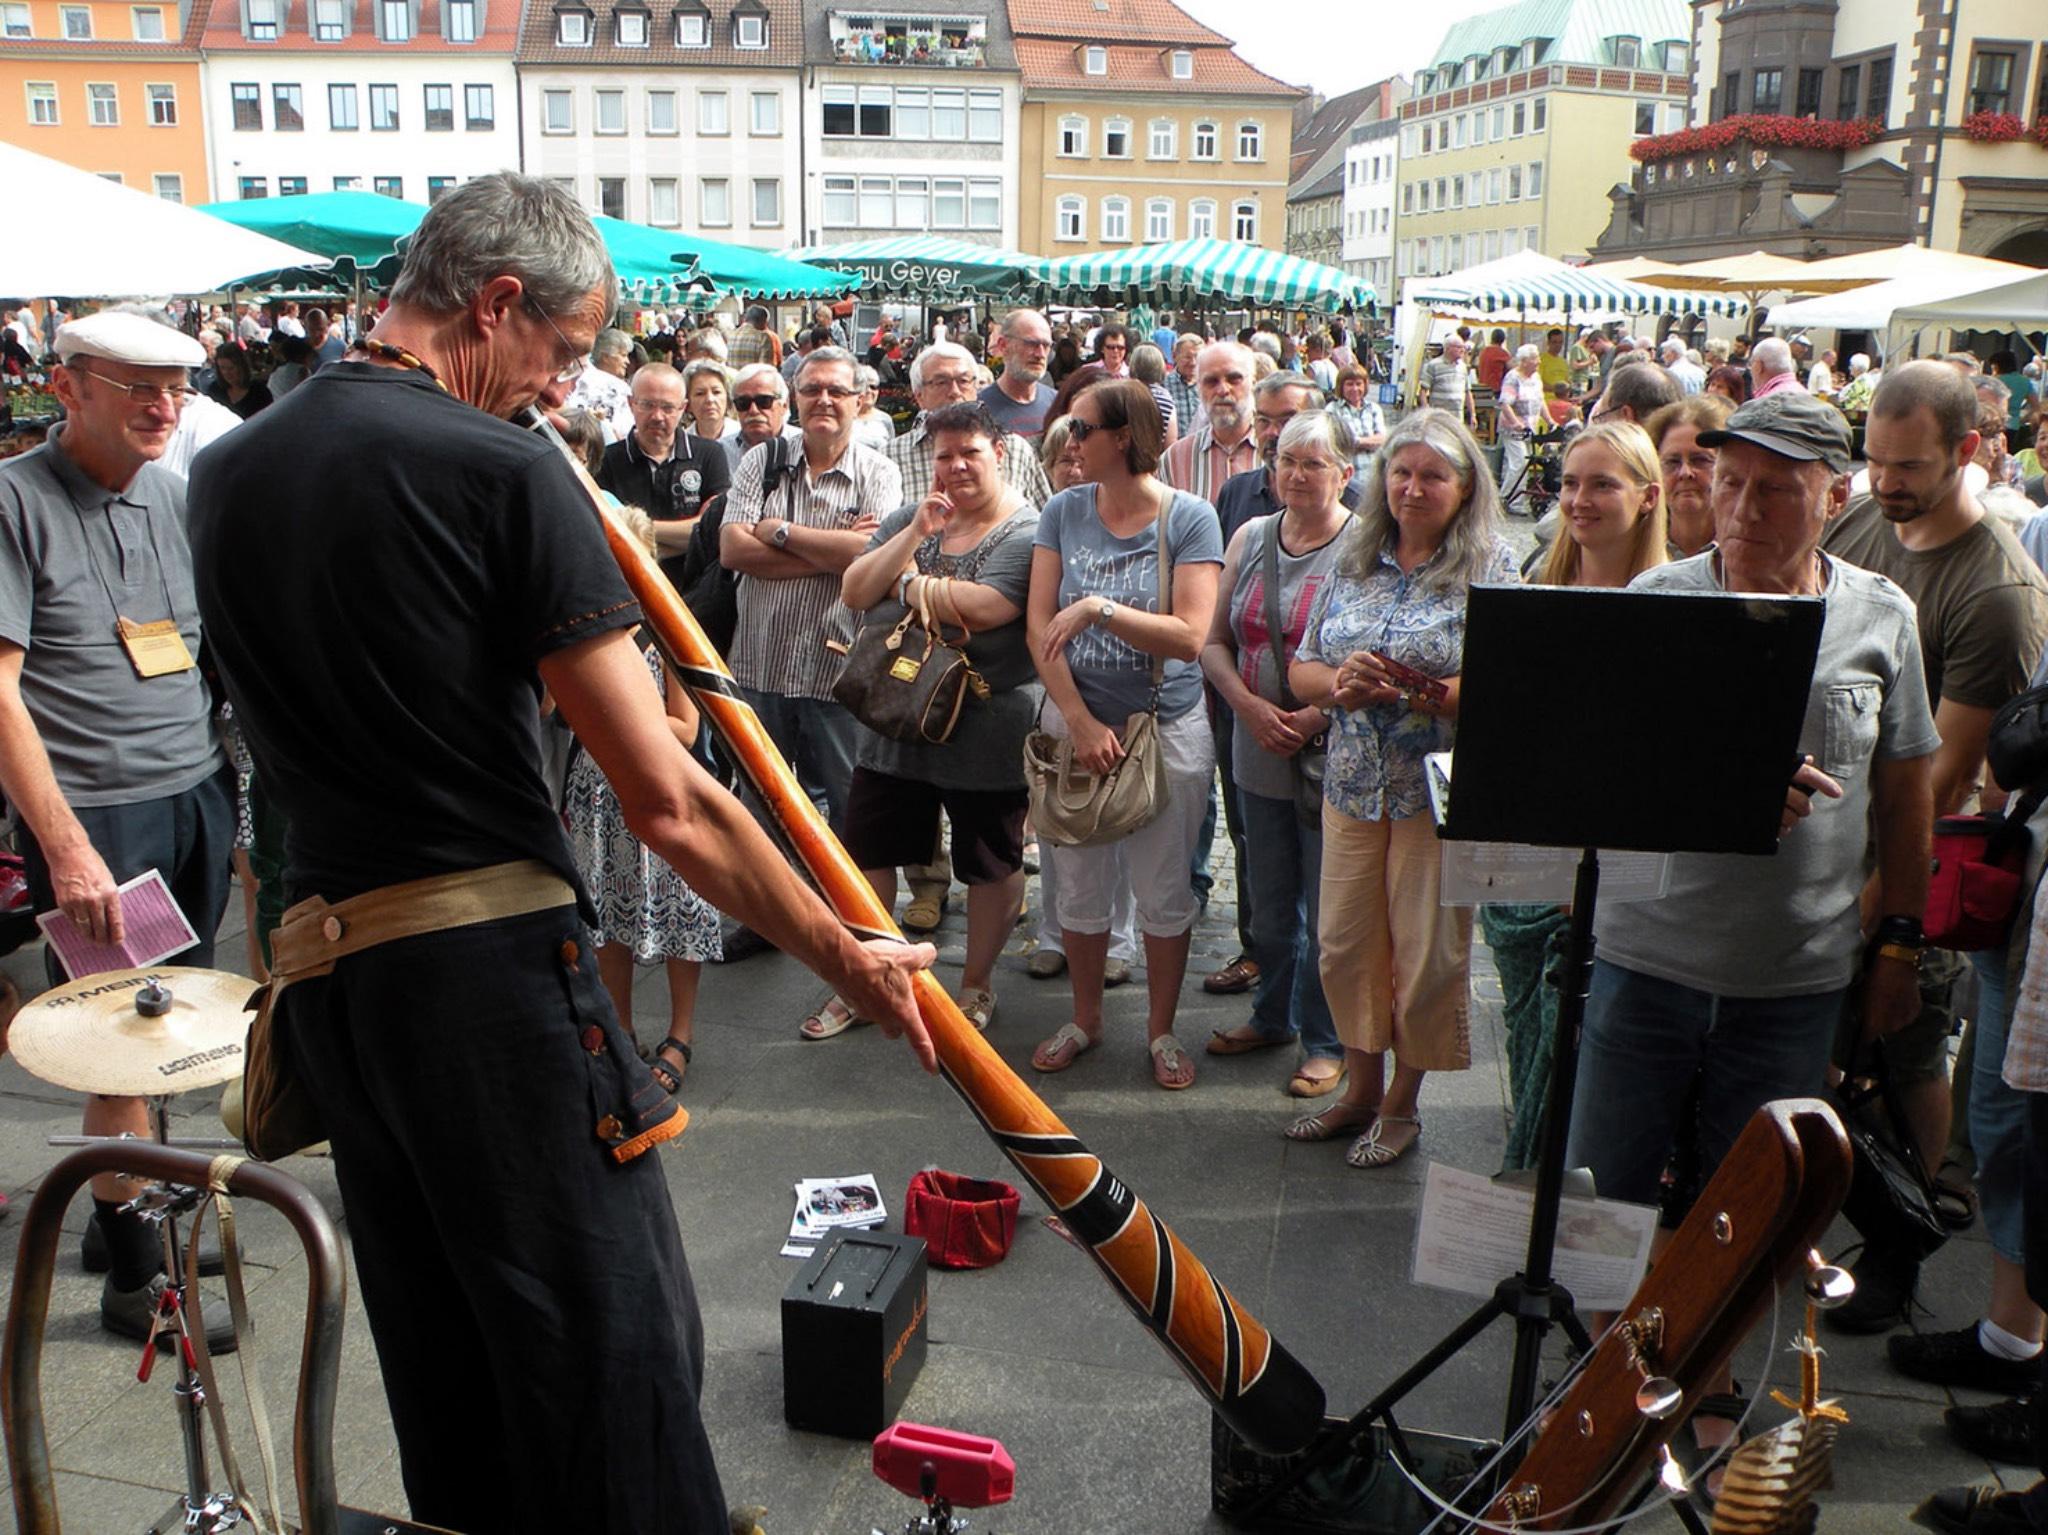 Straßenmusiker beim letztjährigen Schweinfurter Pflasterklang. Foto: KulturPackt Schweinfurt e.V.